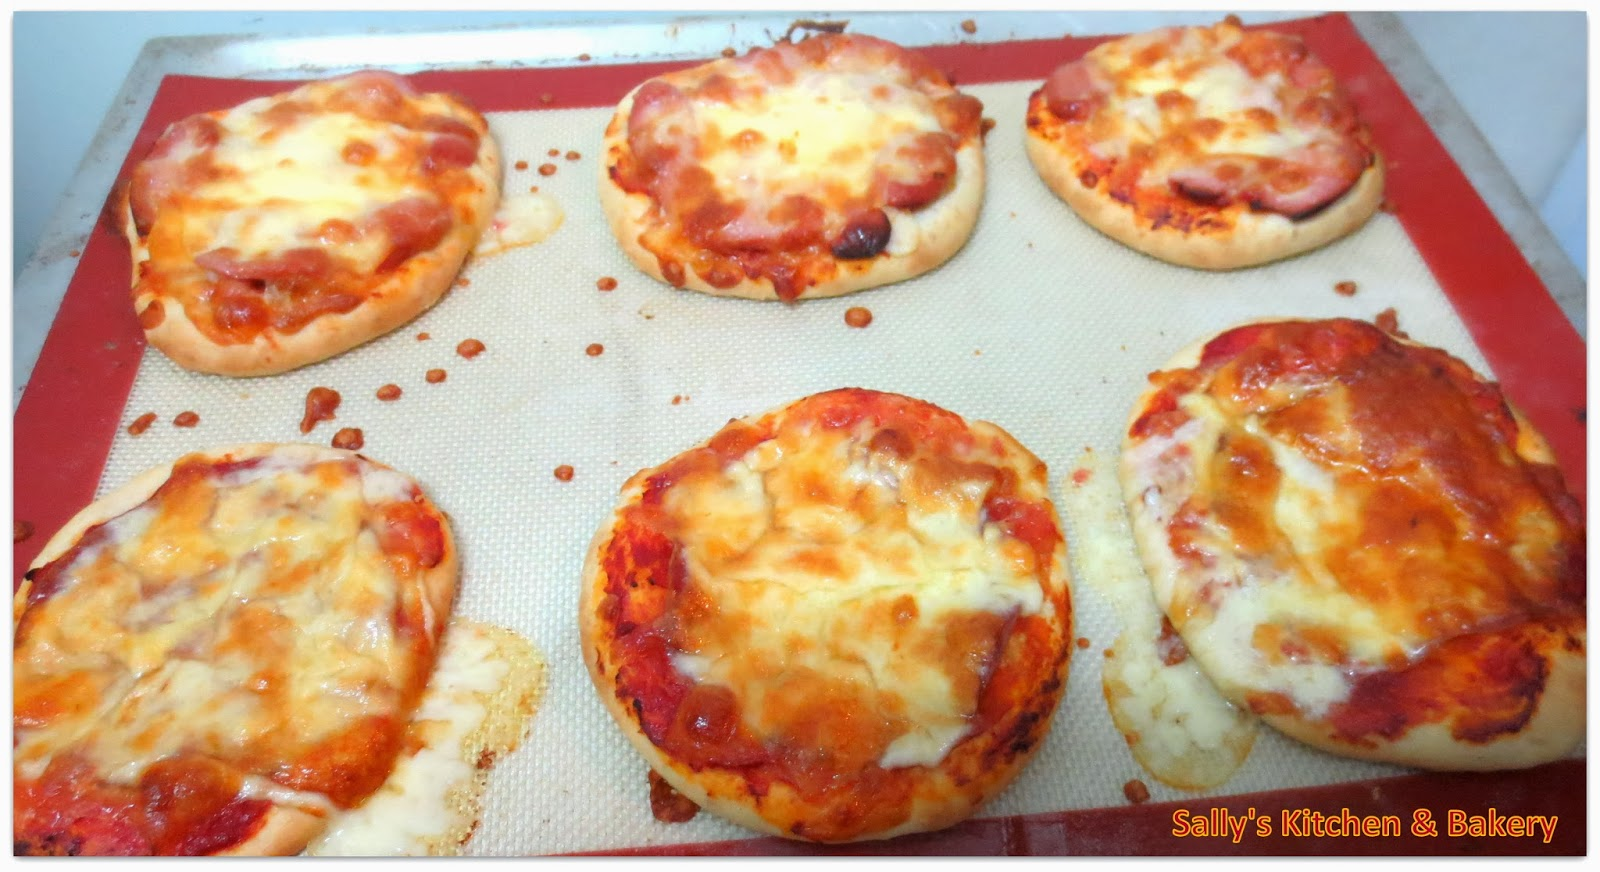 Sally's Kitchen & Bakery: [40分鐘 ] 簡易薄Pizza / [60分鐘 ] 簡易Pizza包 (附食譜)